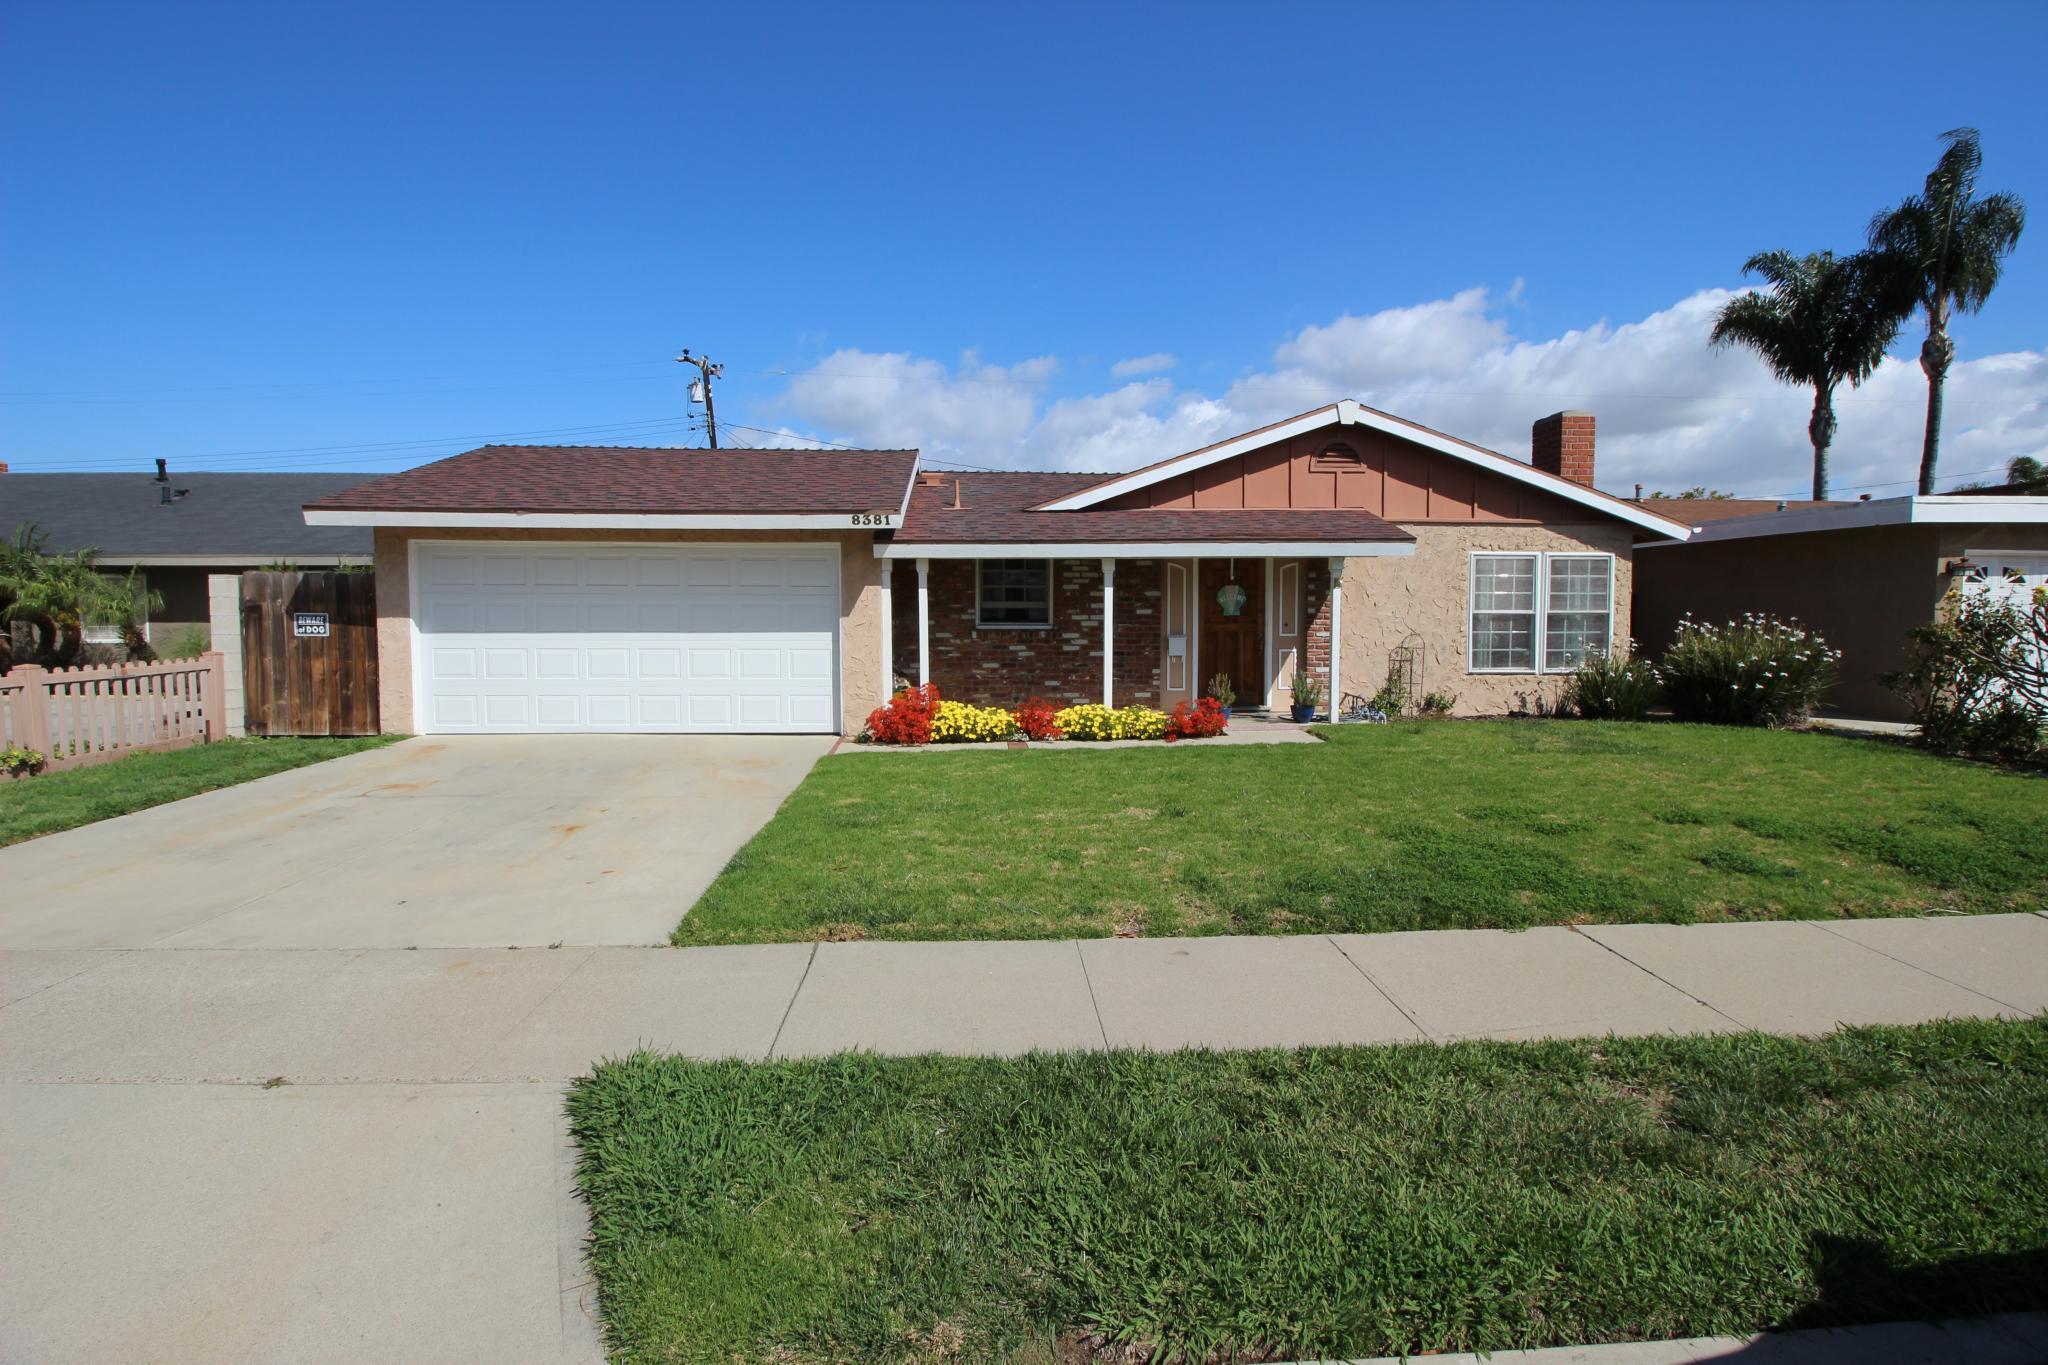 8381 Malloy Dr For Rent - Huntington Beach, CA | Trulia